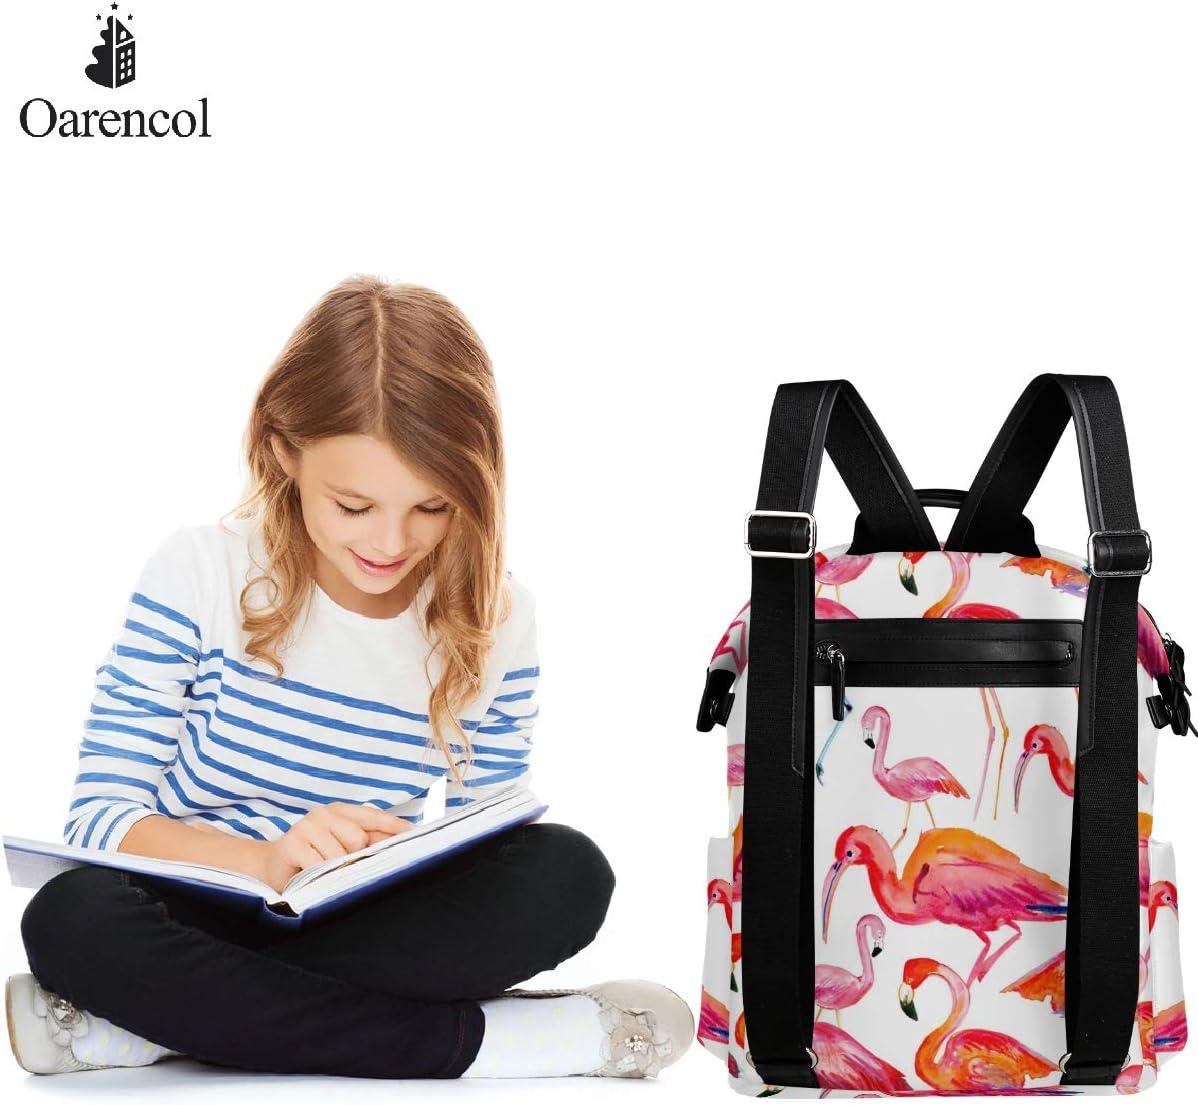 Oarencol Watercolor Red Flamingo Backpack Summer Animal Pink Bird School Book Bag Travel Hiking Camping Laptop Daypack